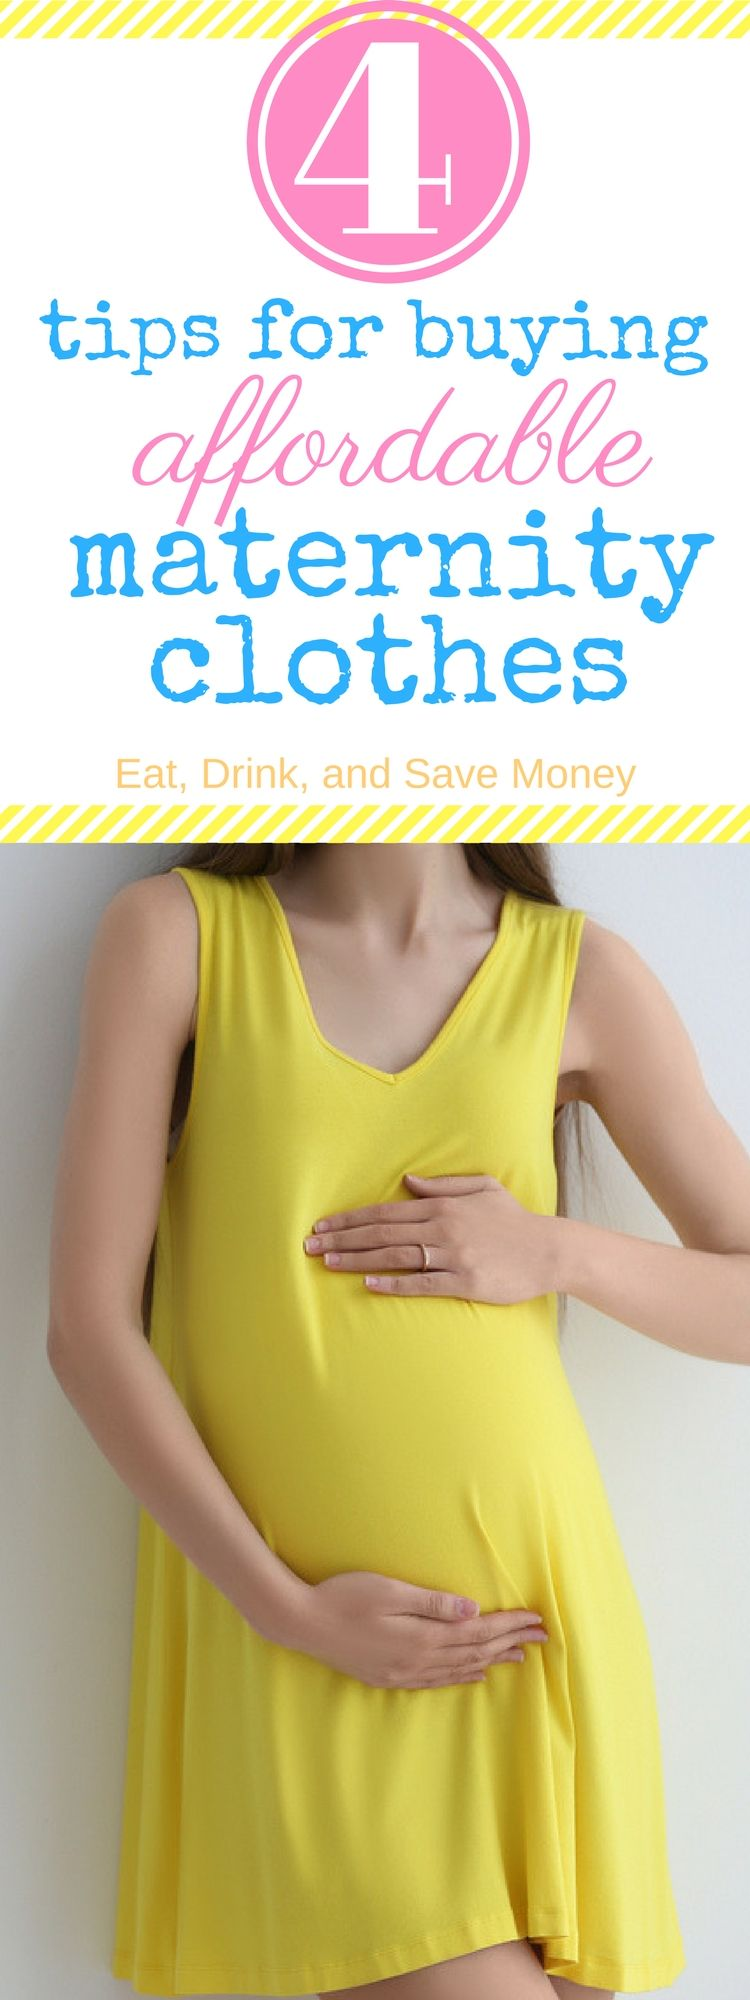 22 Best Cheap Maternity Clothes Ideas Cheap Maternity Clothes Maternity Clothes Maternity